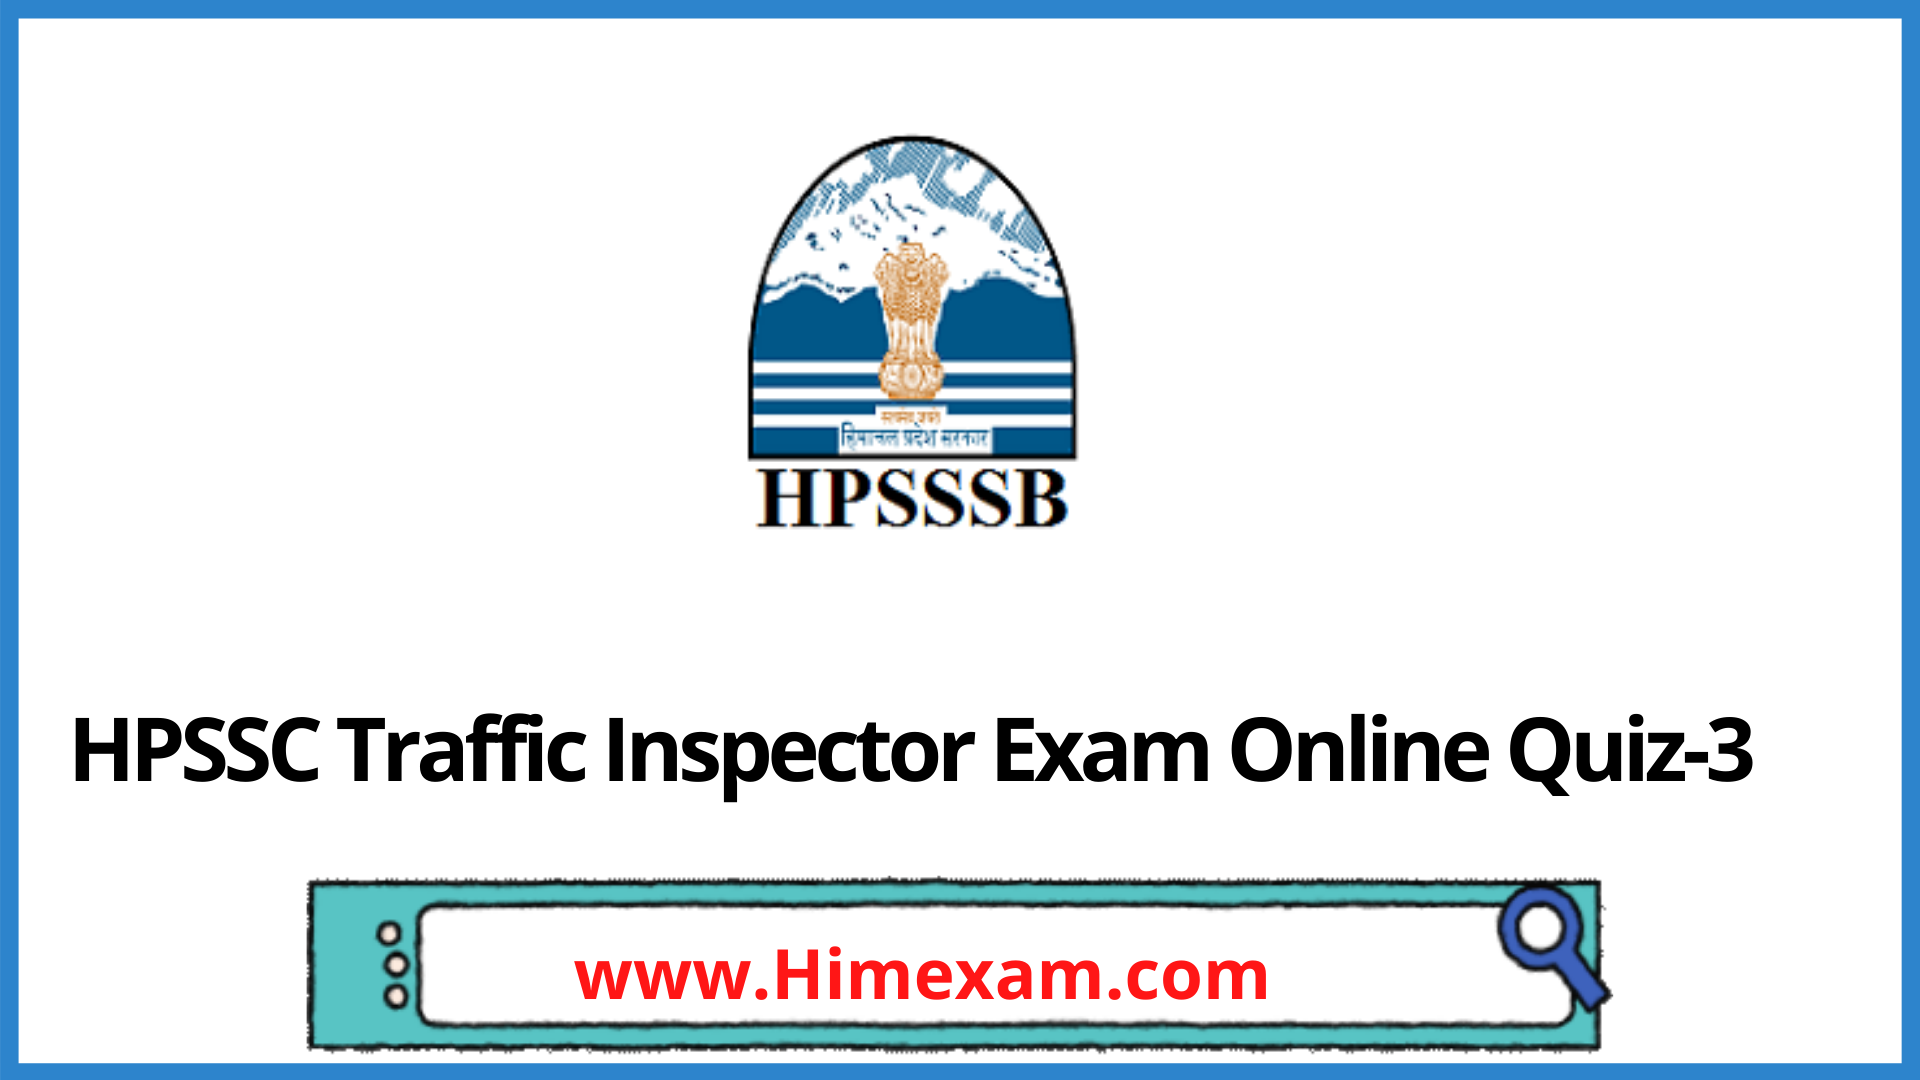 HPSSC Traffic Inspector Exam Online Quiz-3